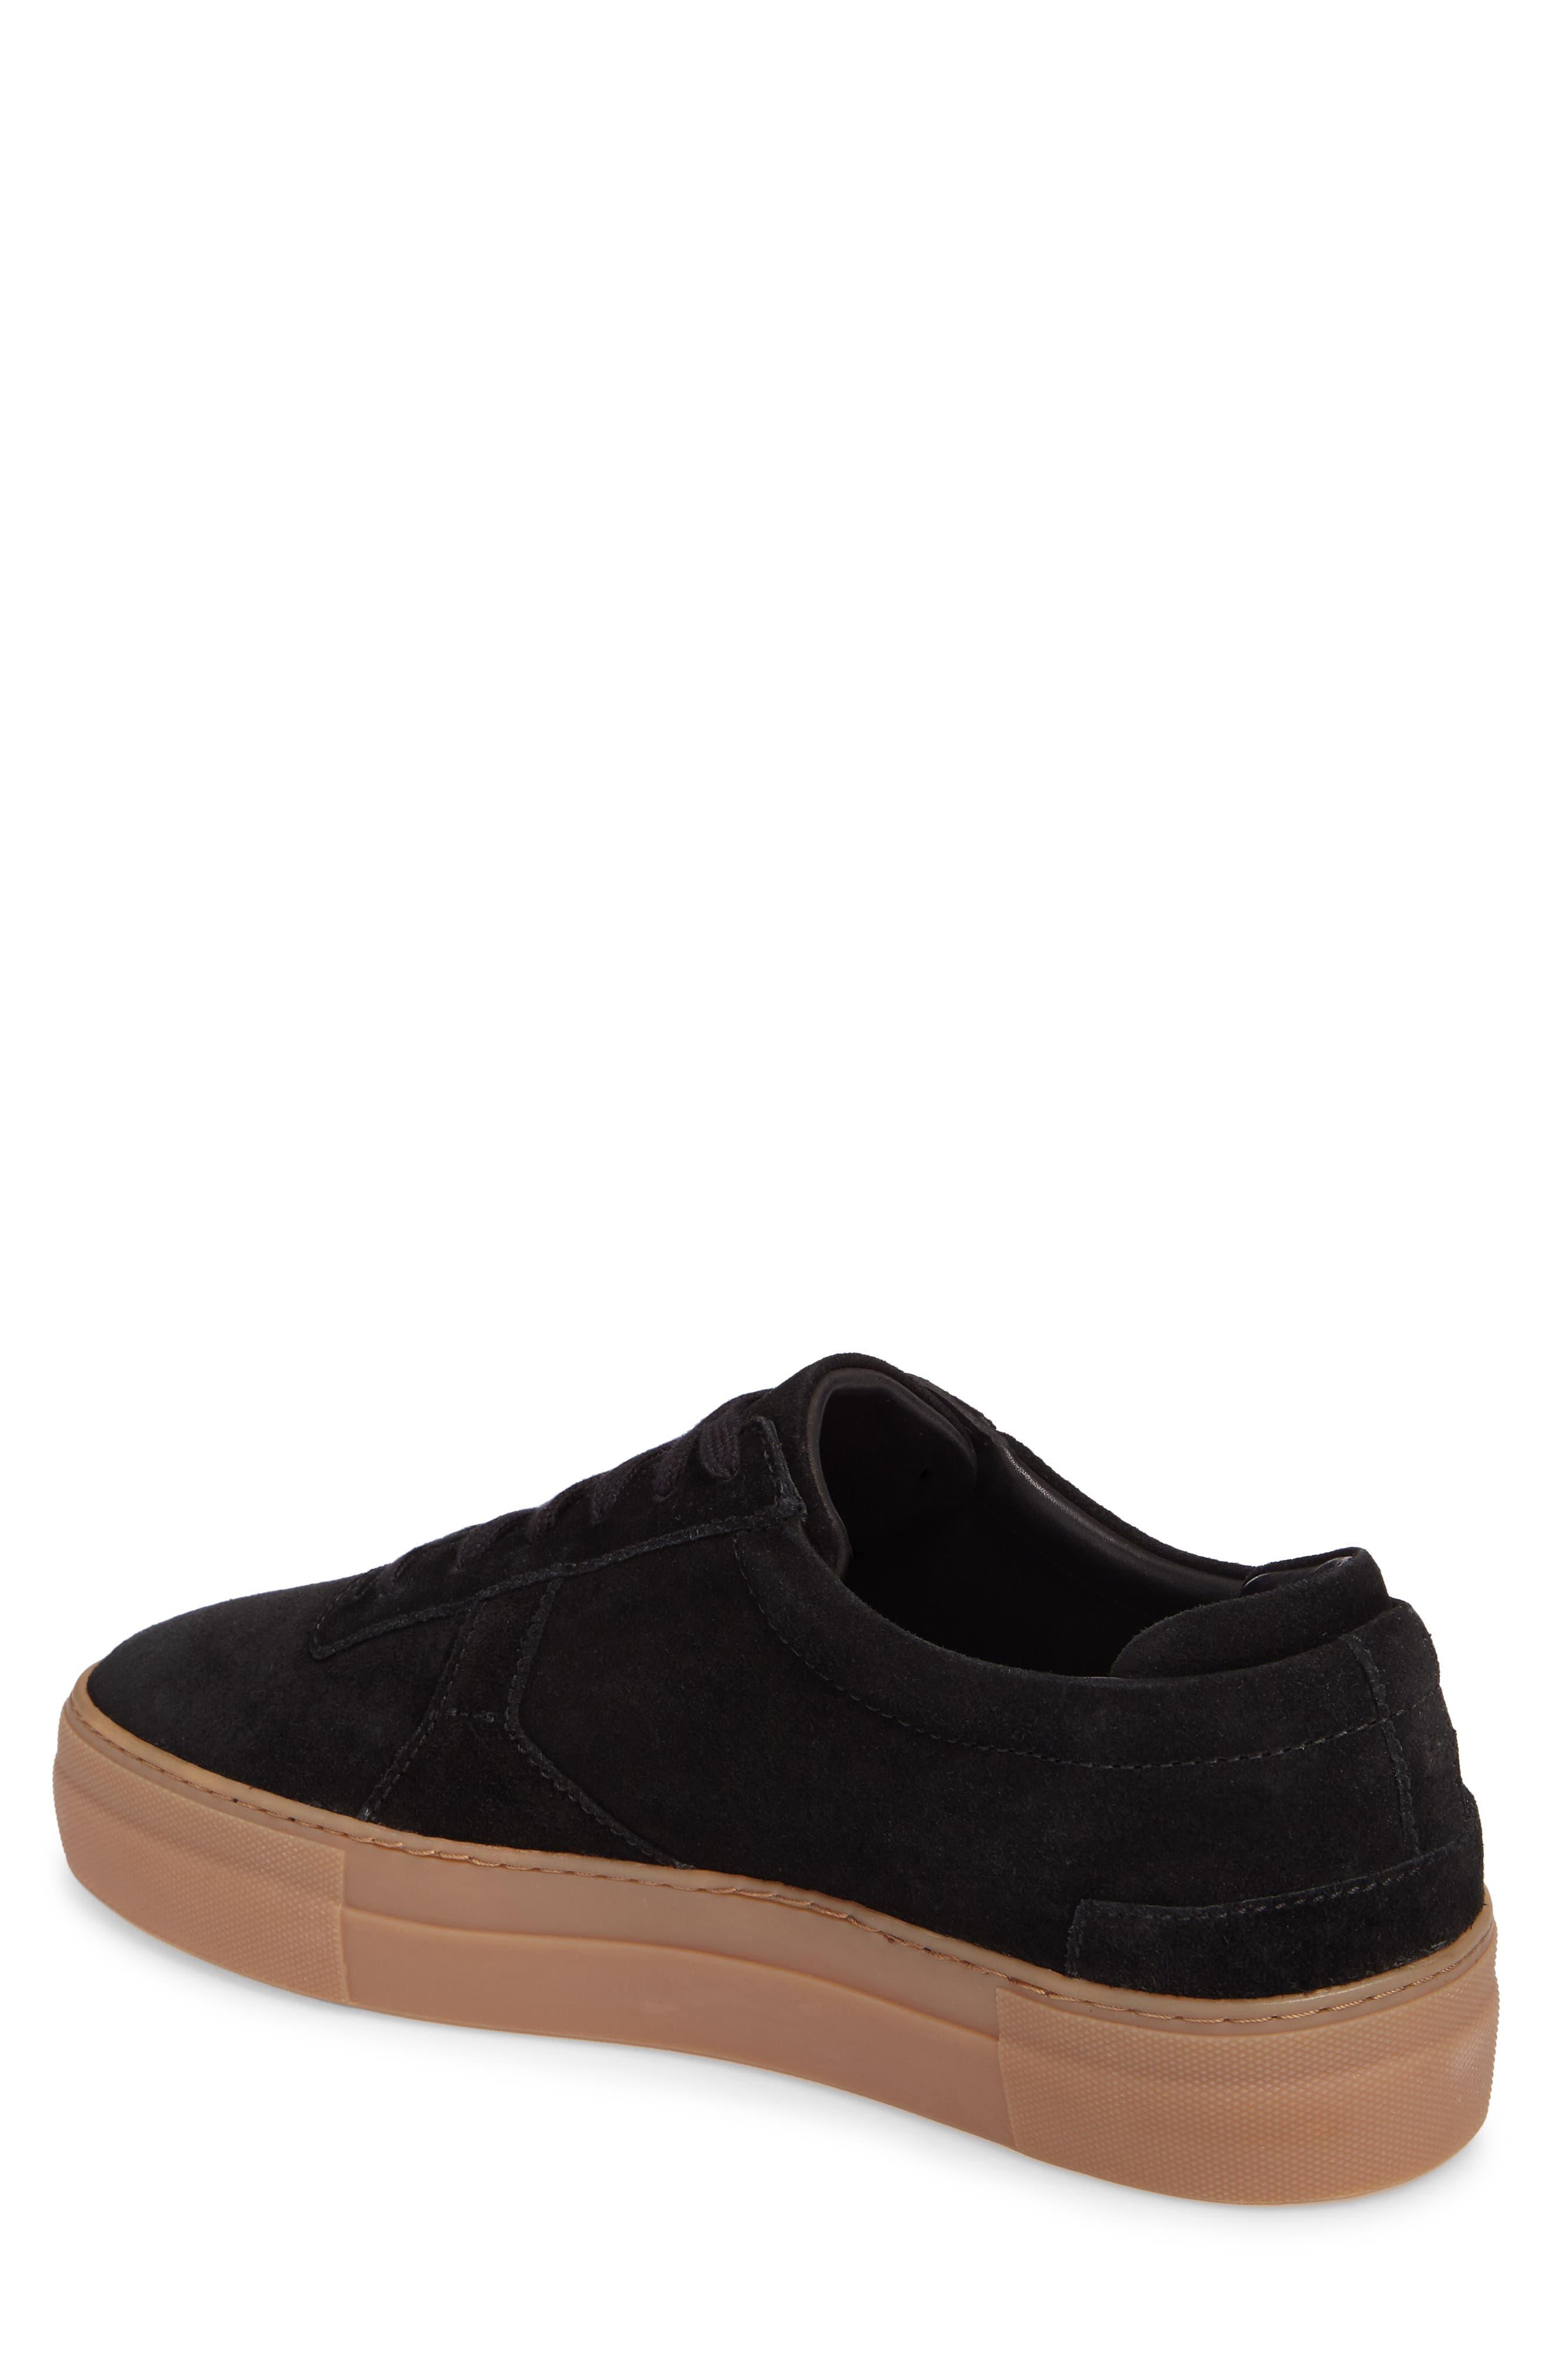 Platform Sneaker,                             Alternate thumbnail 2, color,